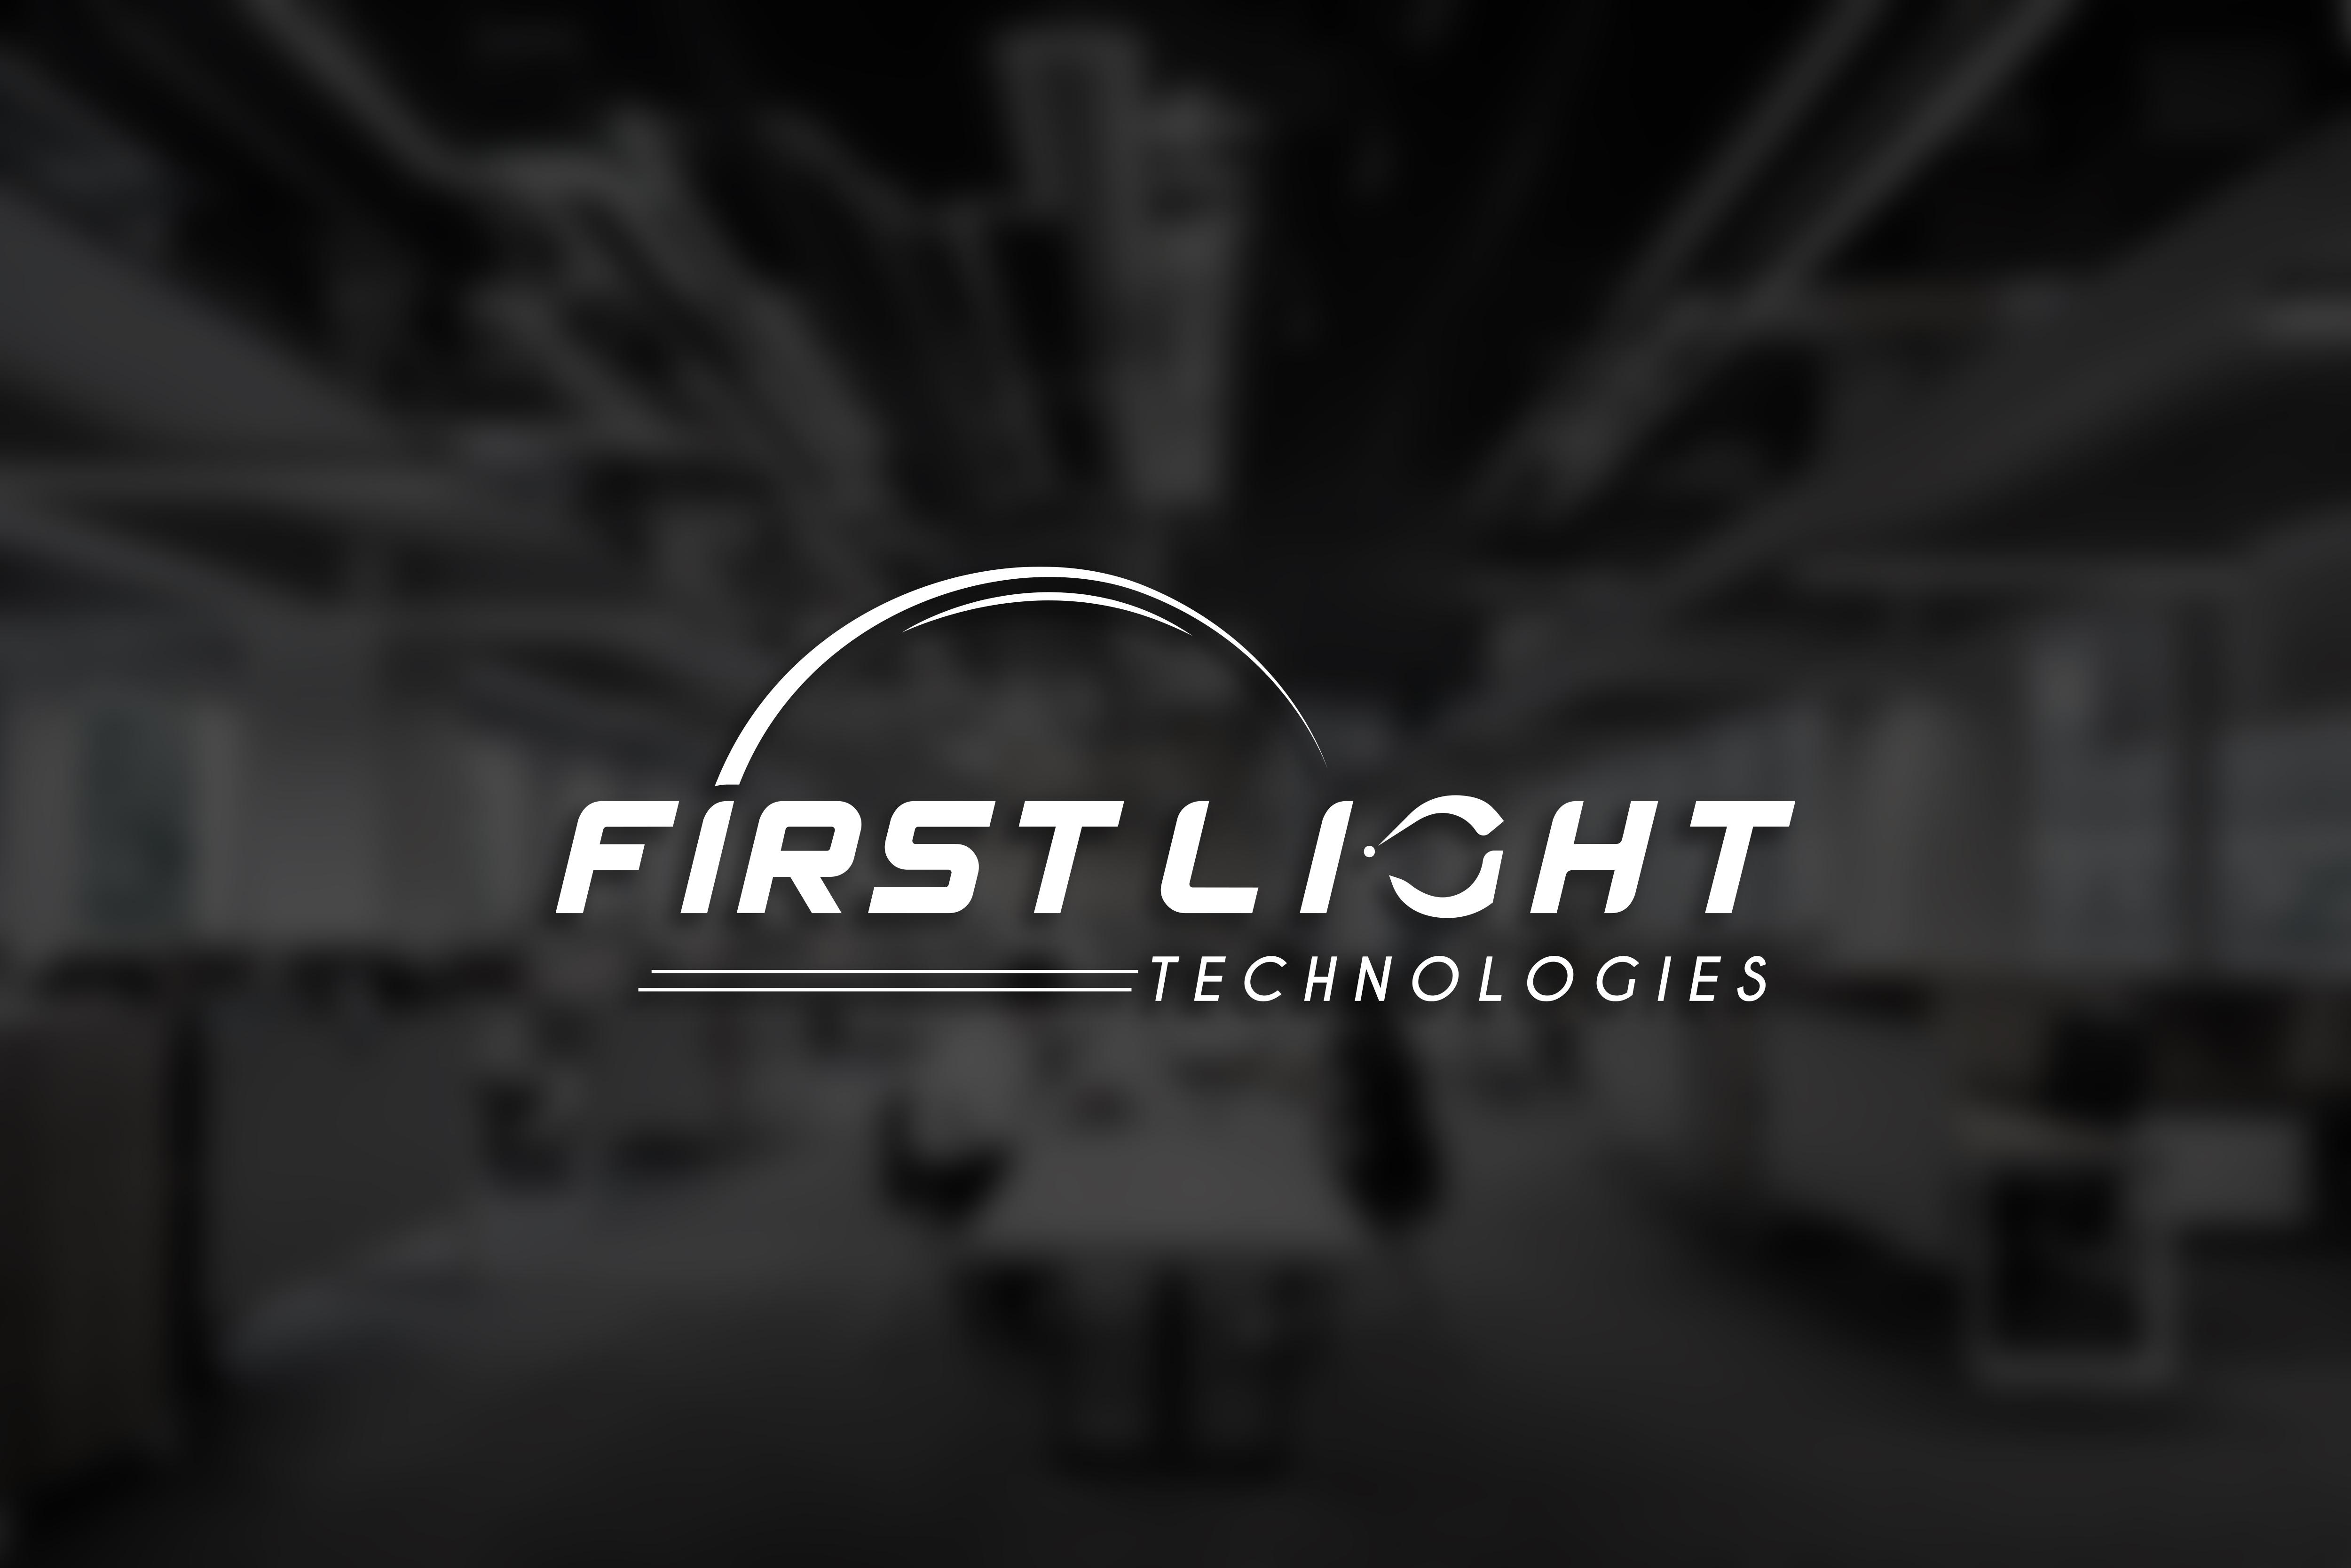 Design minimalist,attractive,versatile flat logo design for your brand